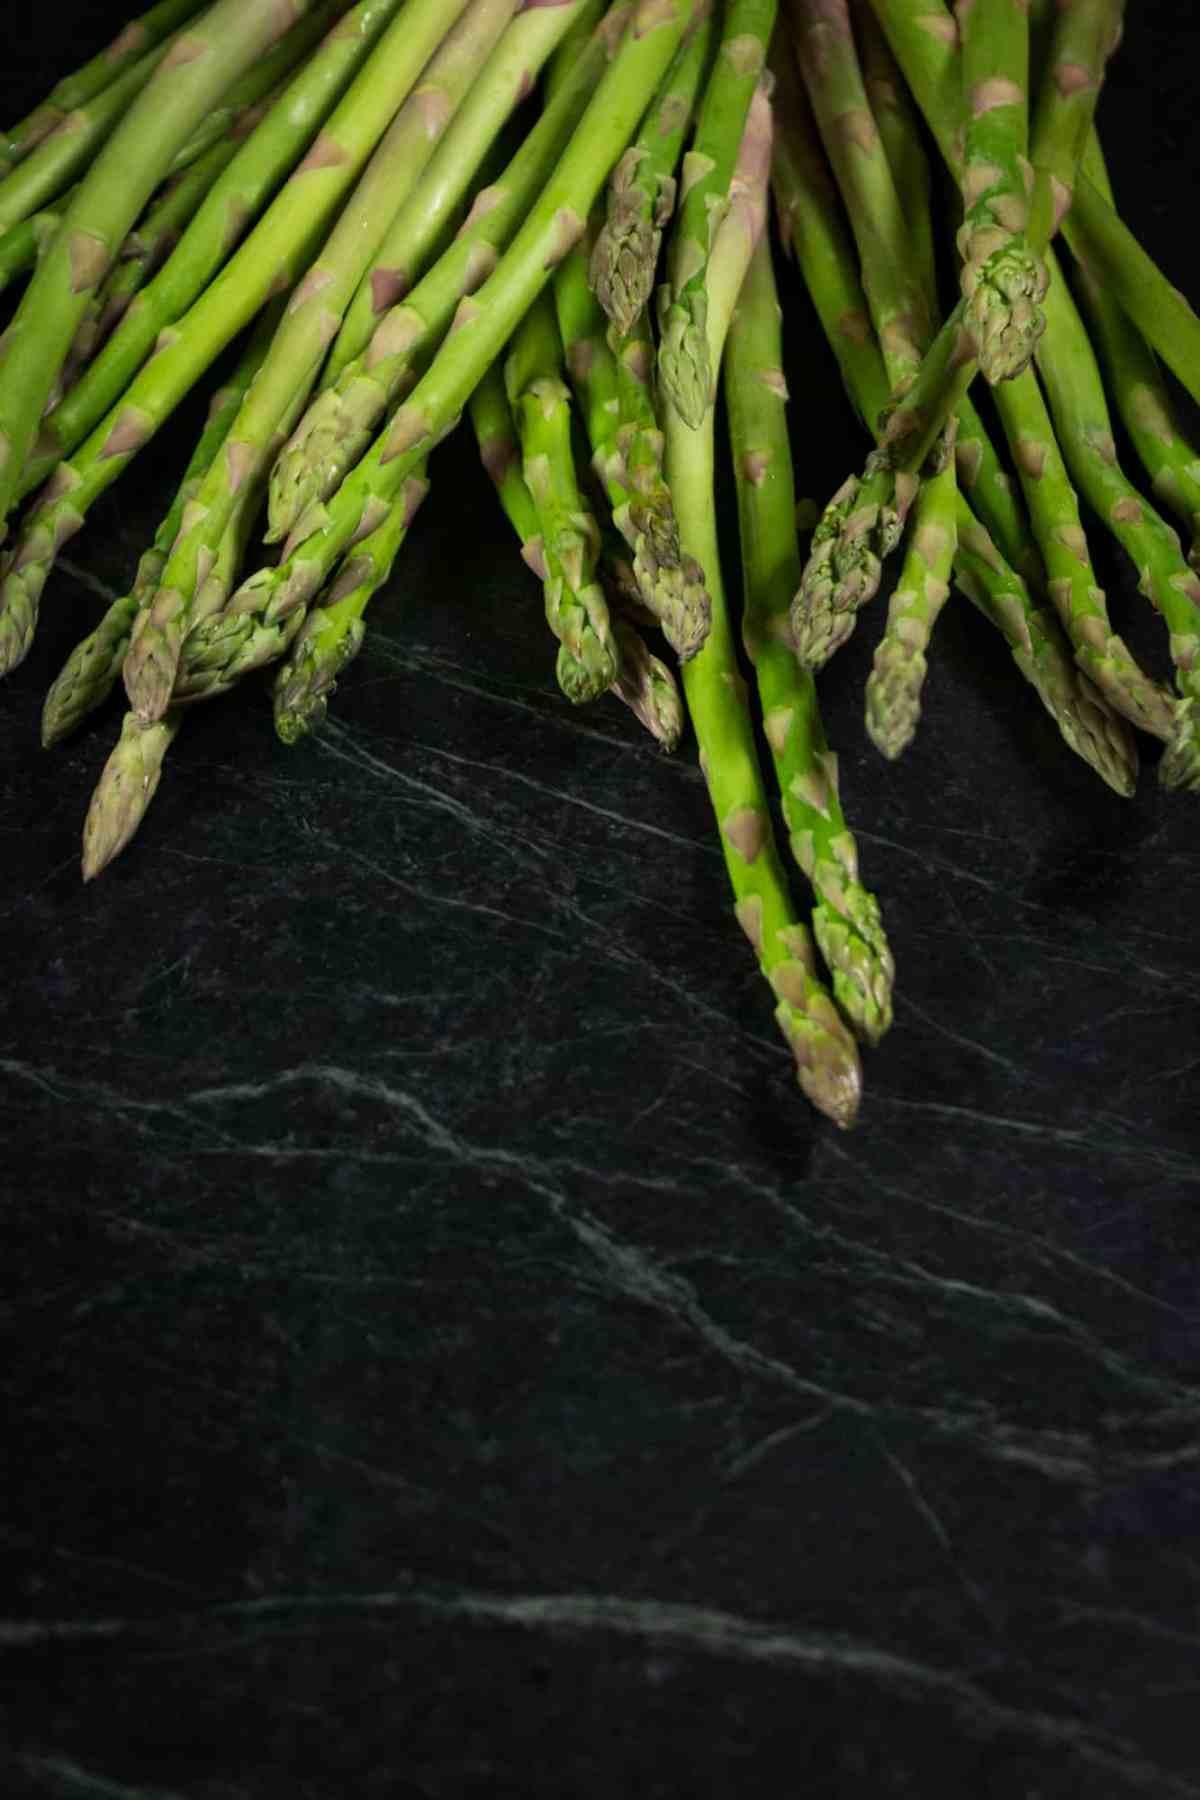 Asparagus and Lemon Garganelli